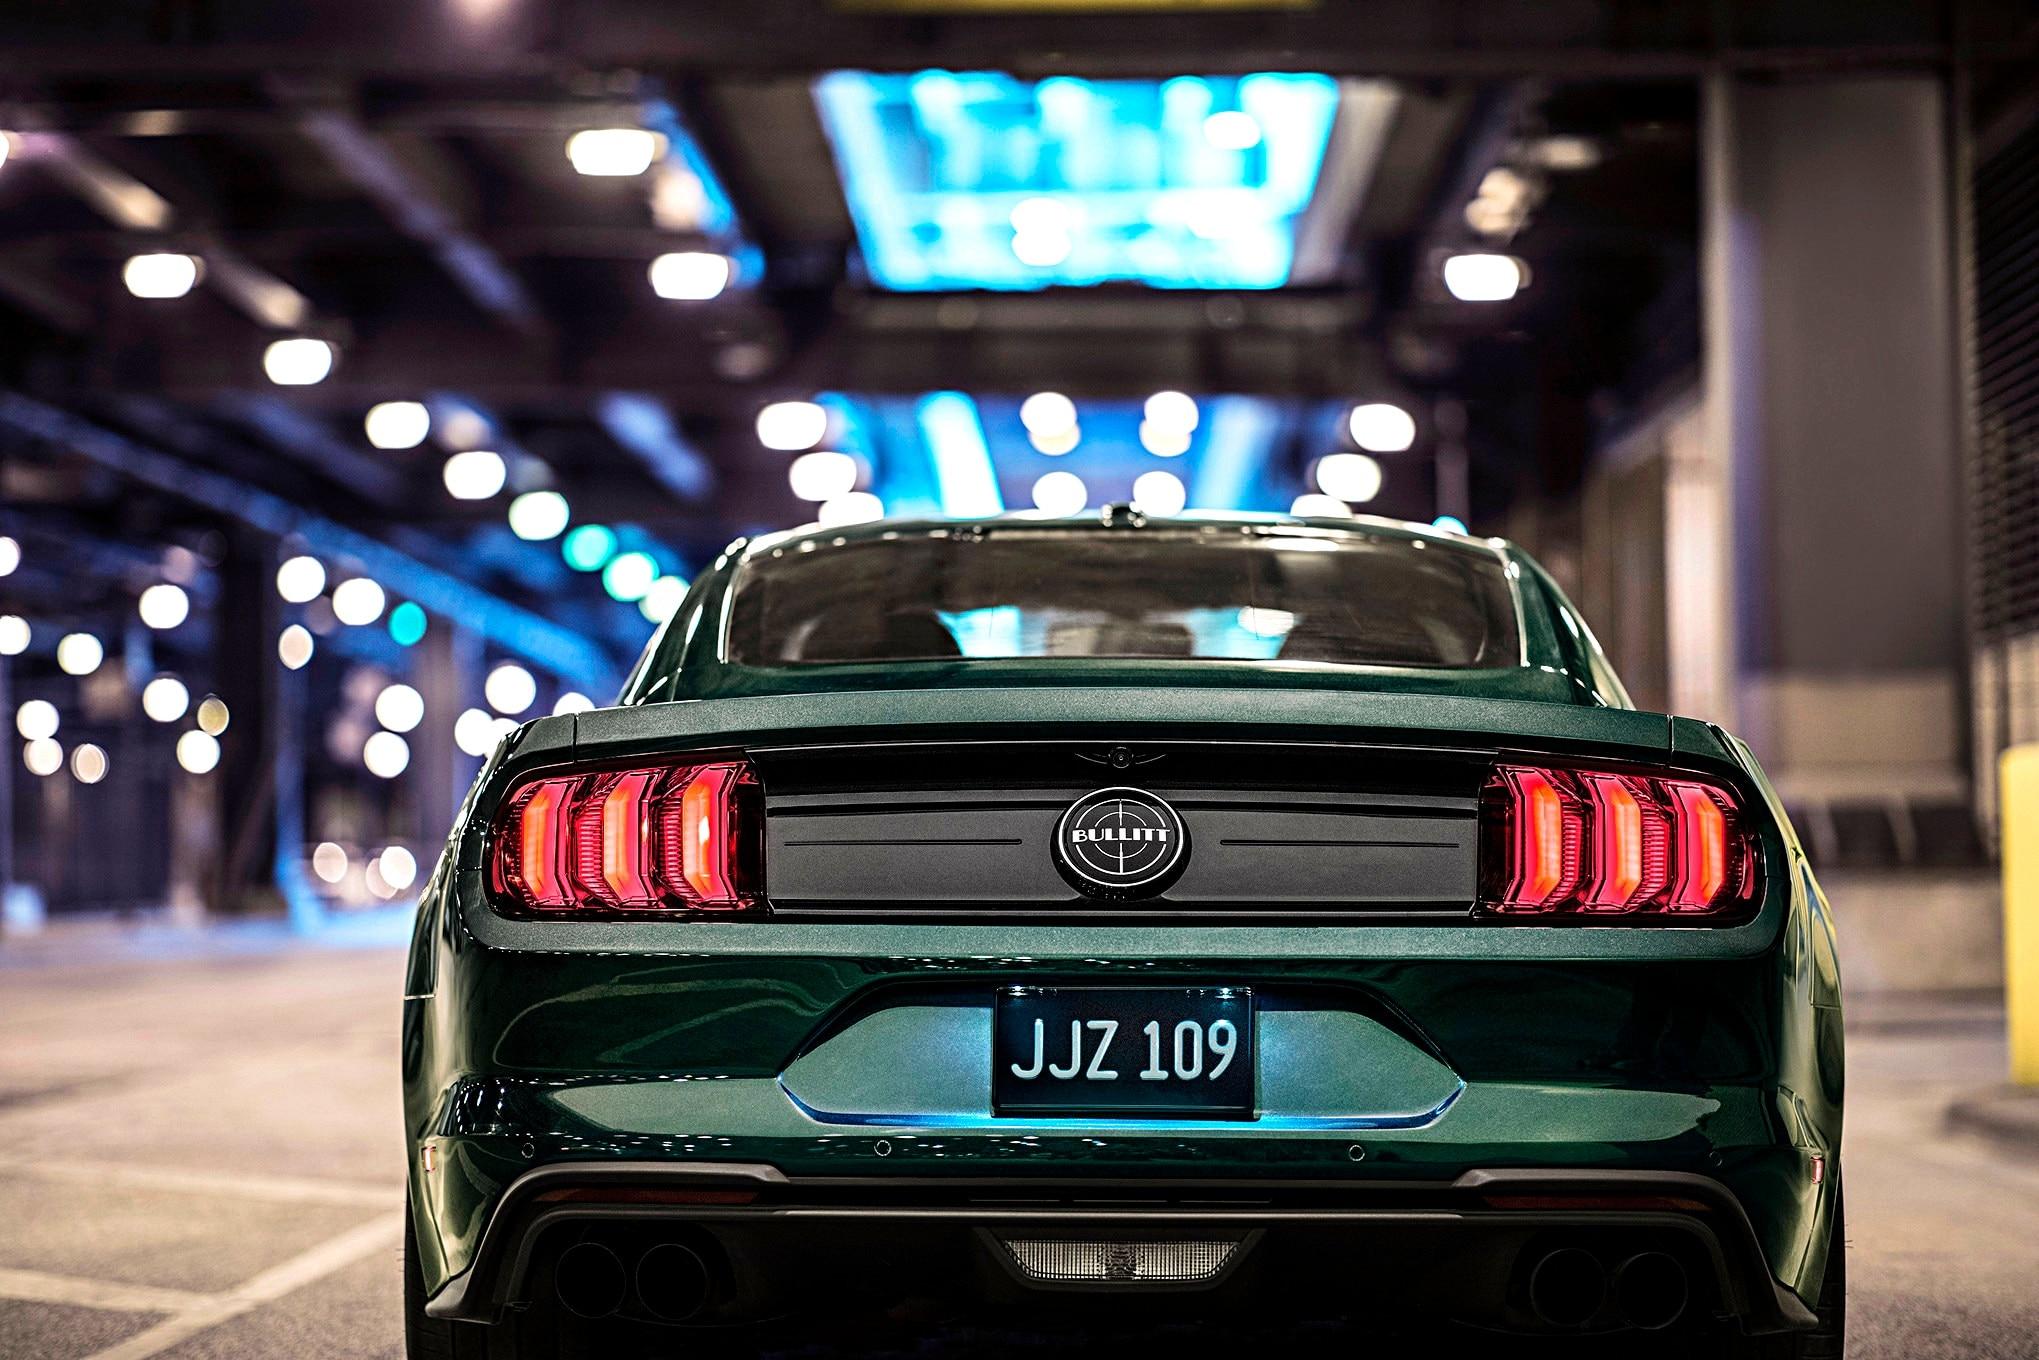 2019 Ford Mustang Bullitt Green 4